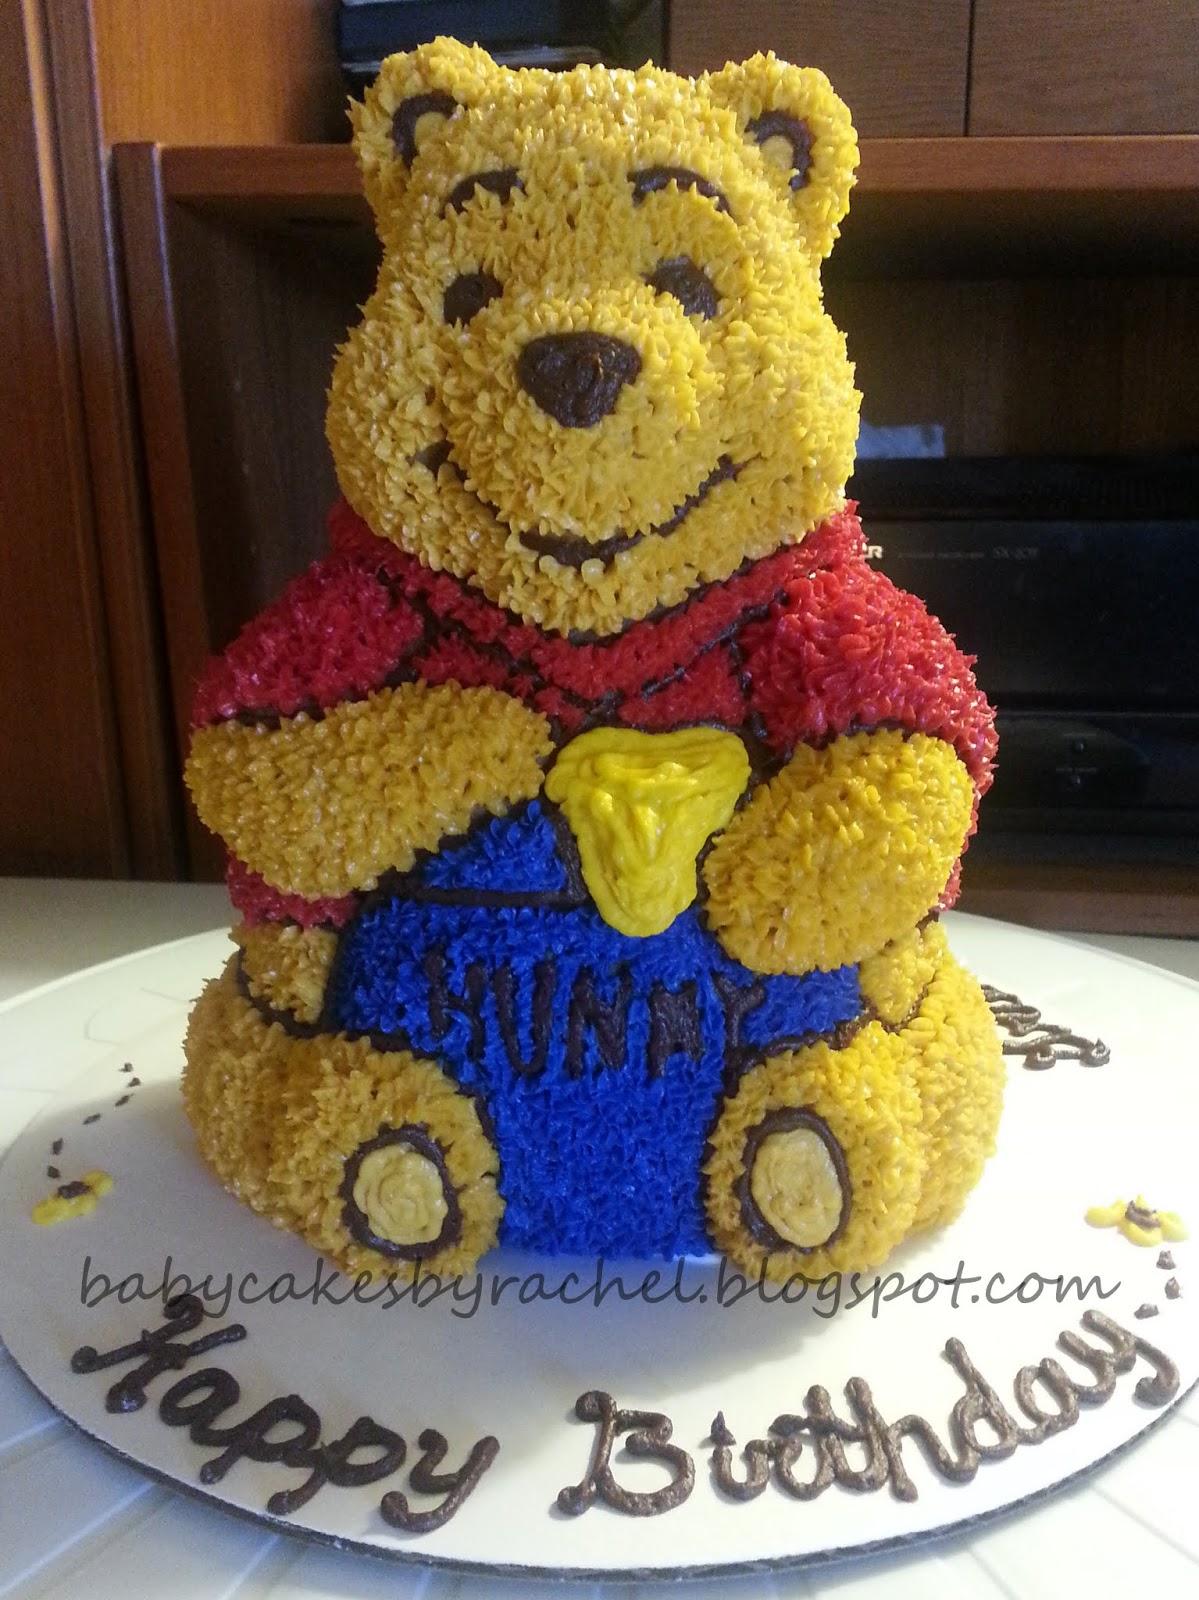 Babycakesbyrachel Pooh Bear Cake How To Bake A 3d Cake